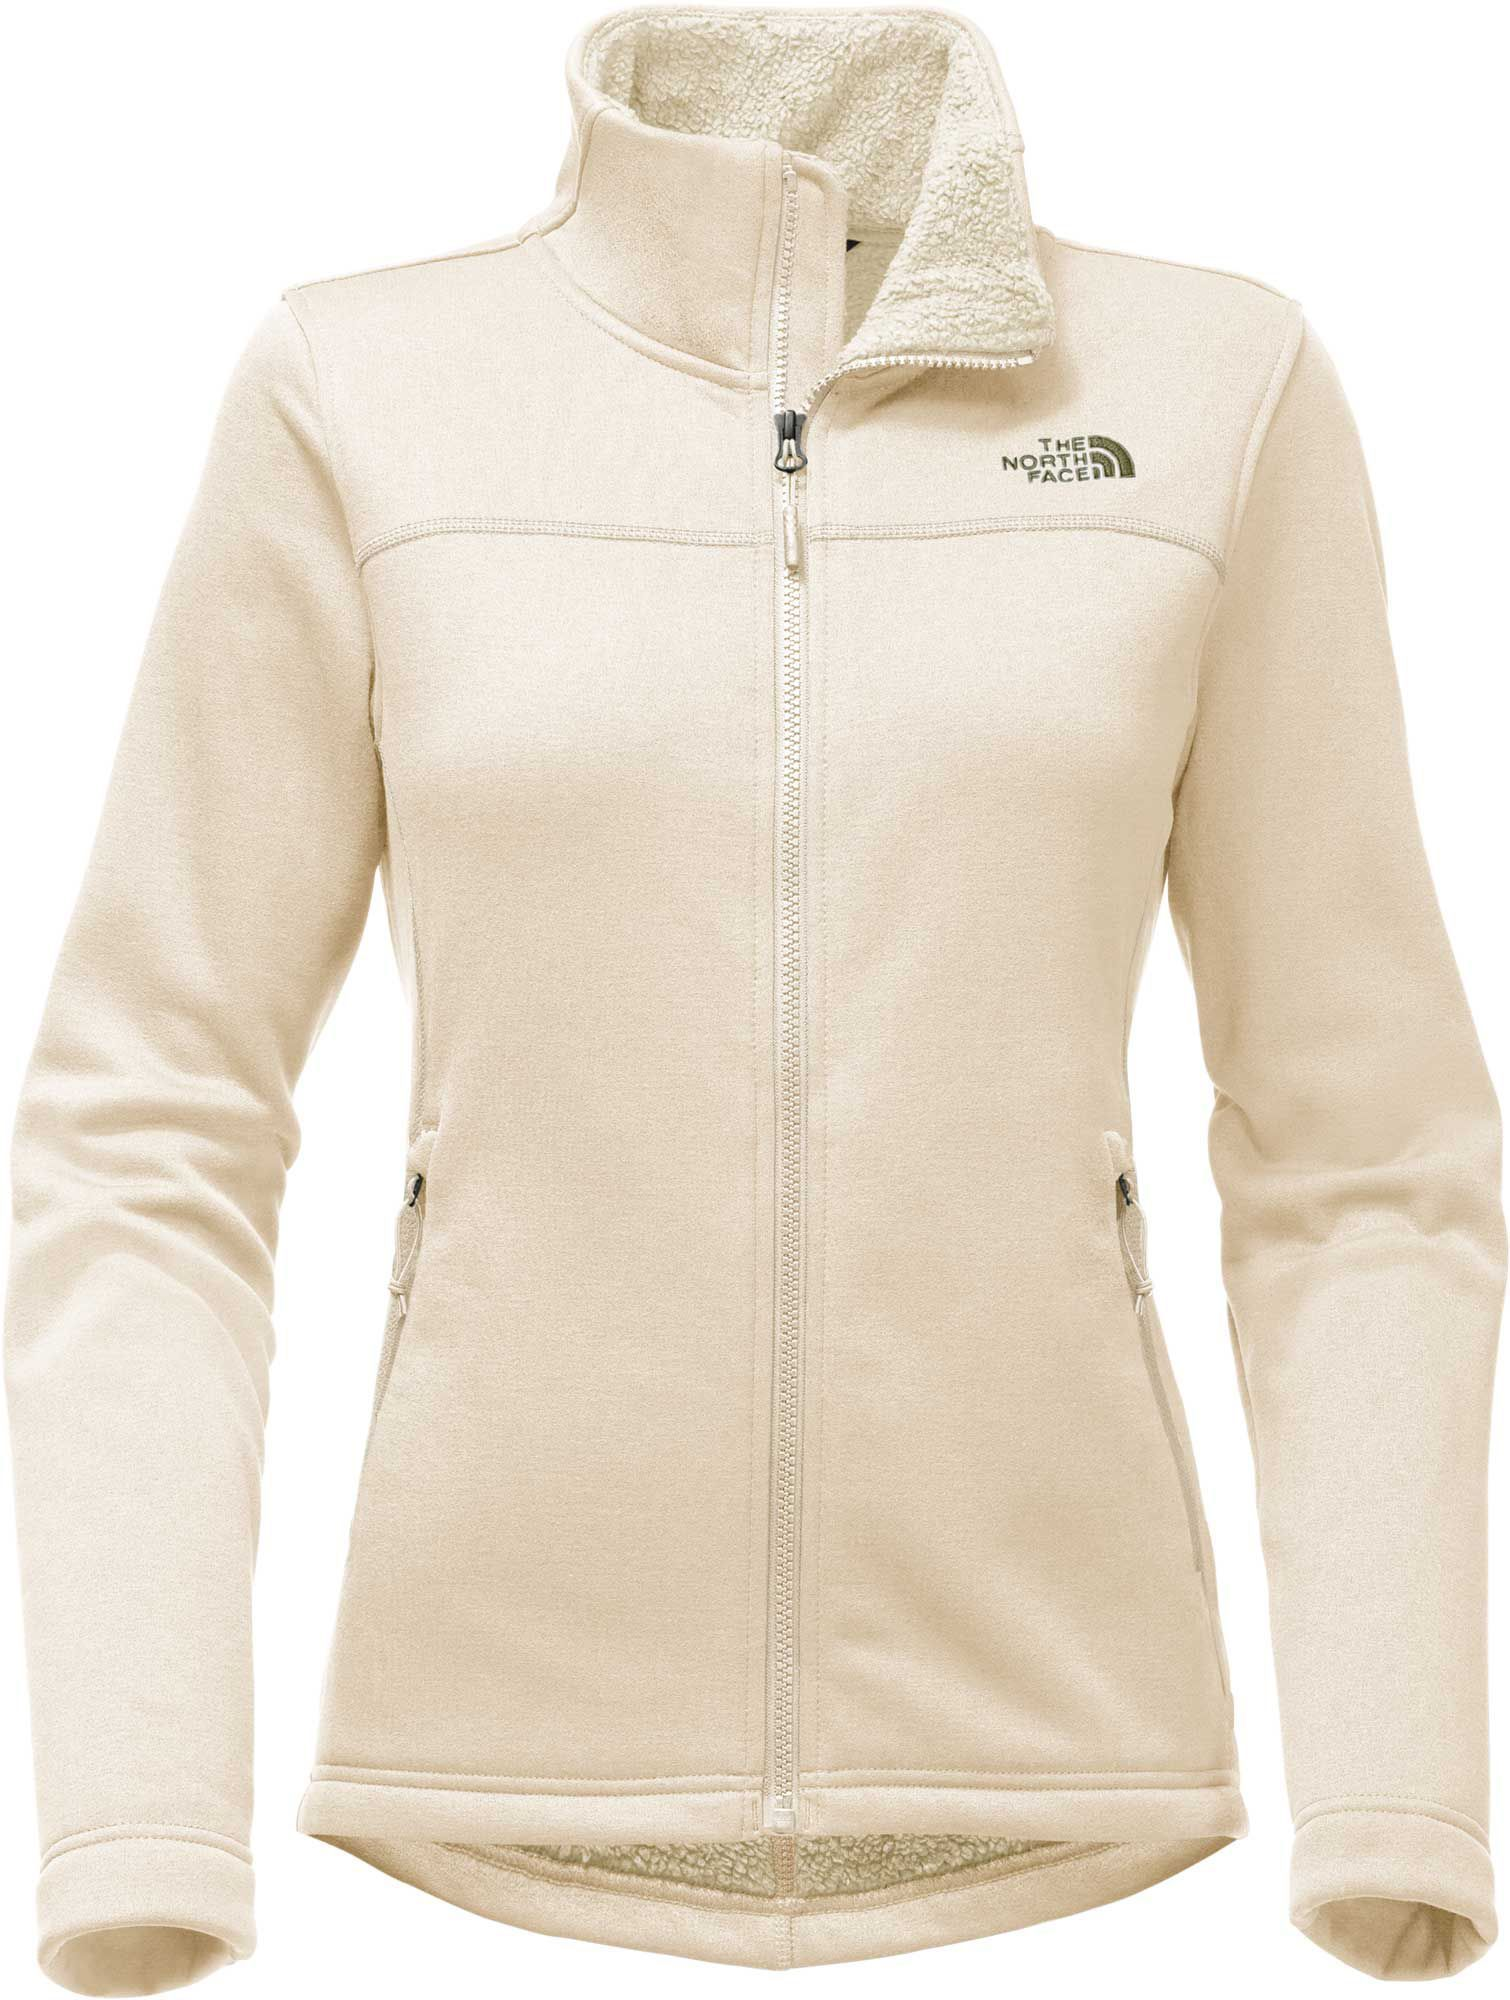 The north face womenus timber full zip fleece jacket size xl